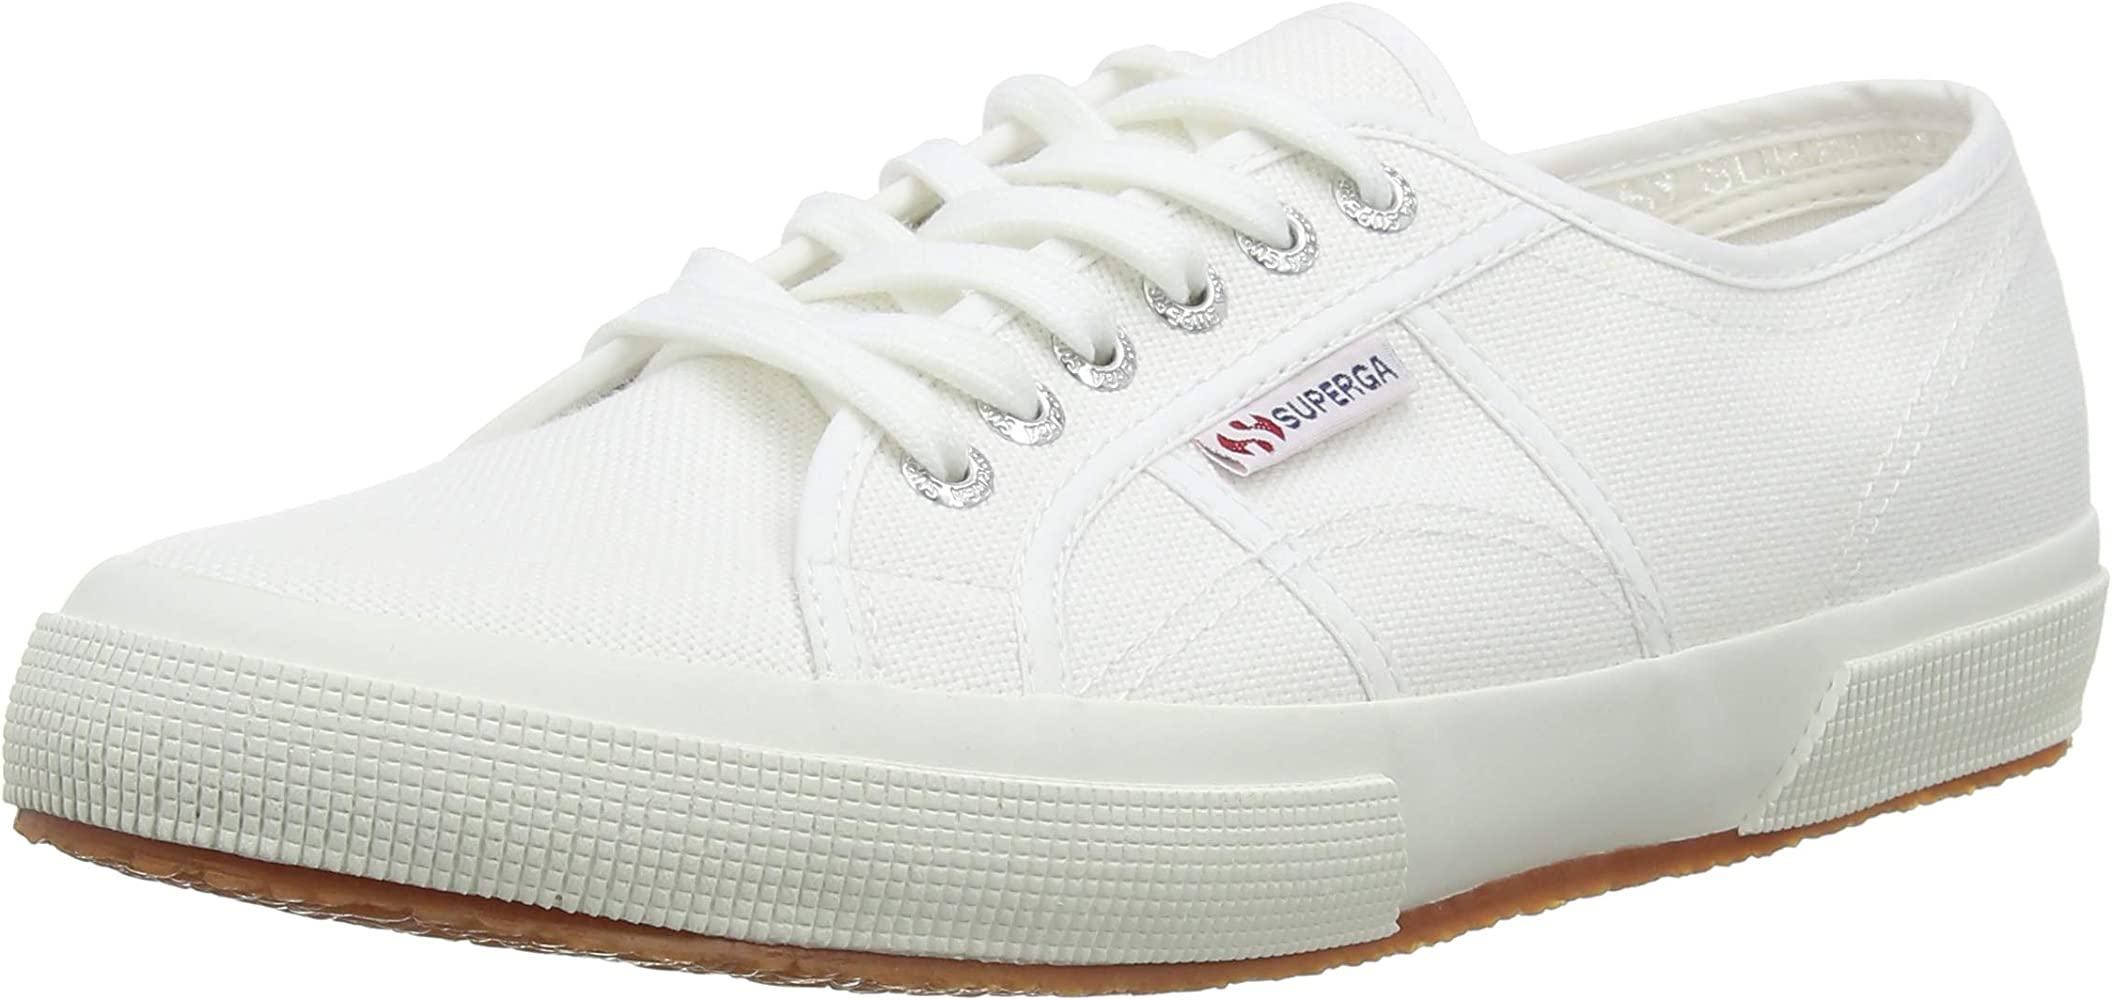 Superga 2750 Jcot Classic, Sneakers bajos Mixta niño, Blanco ...